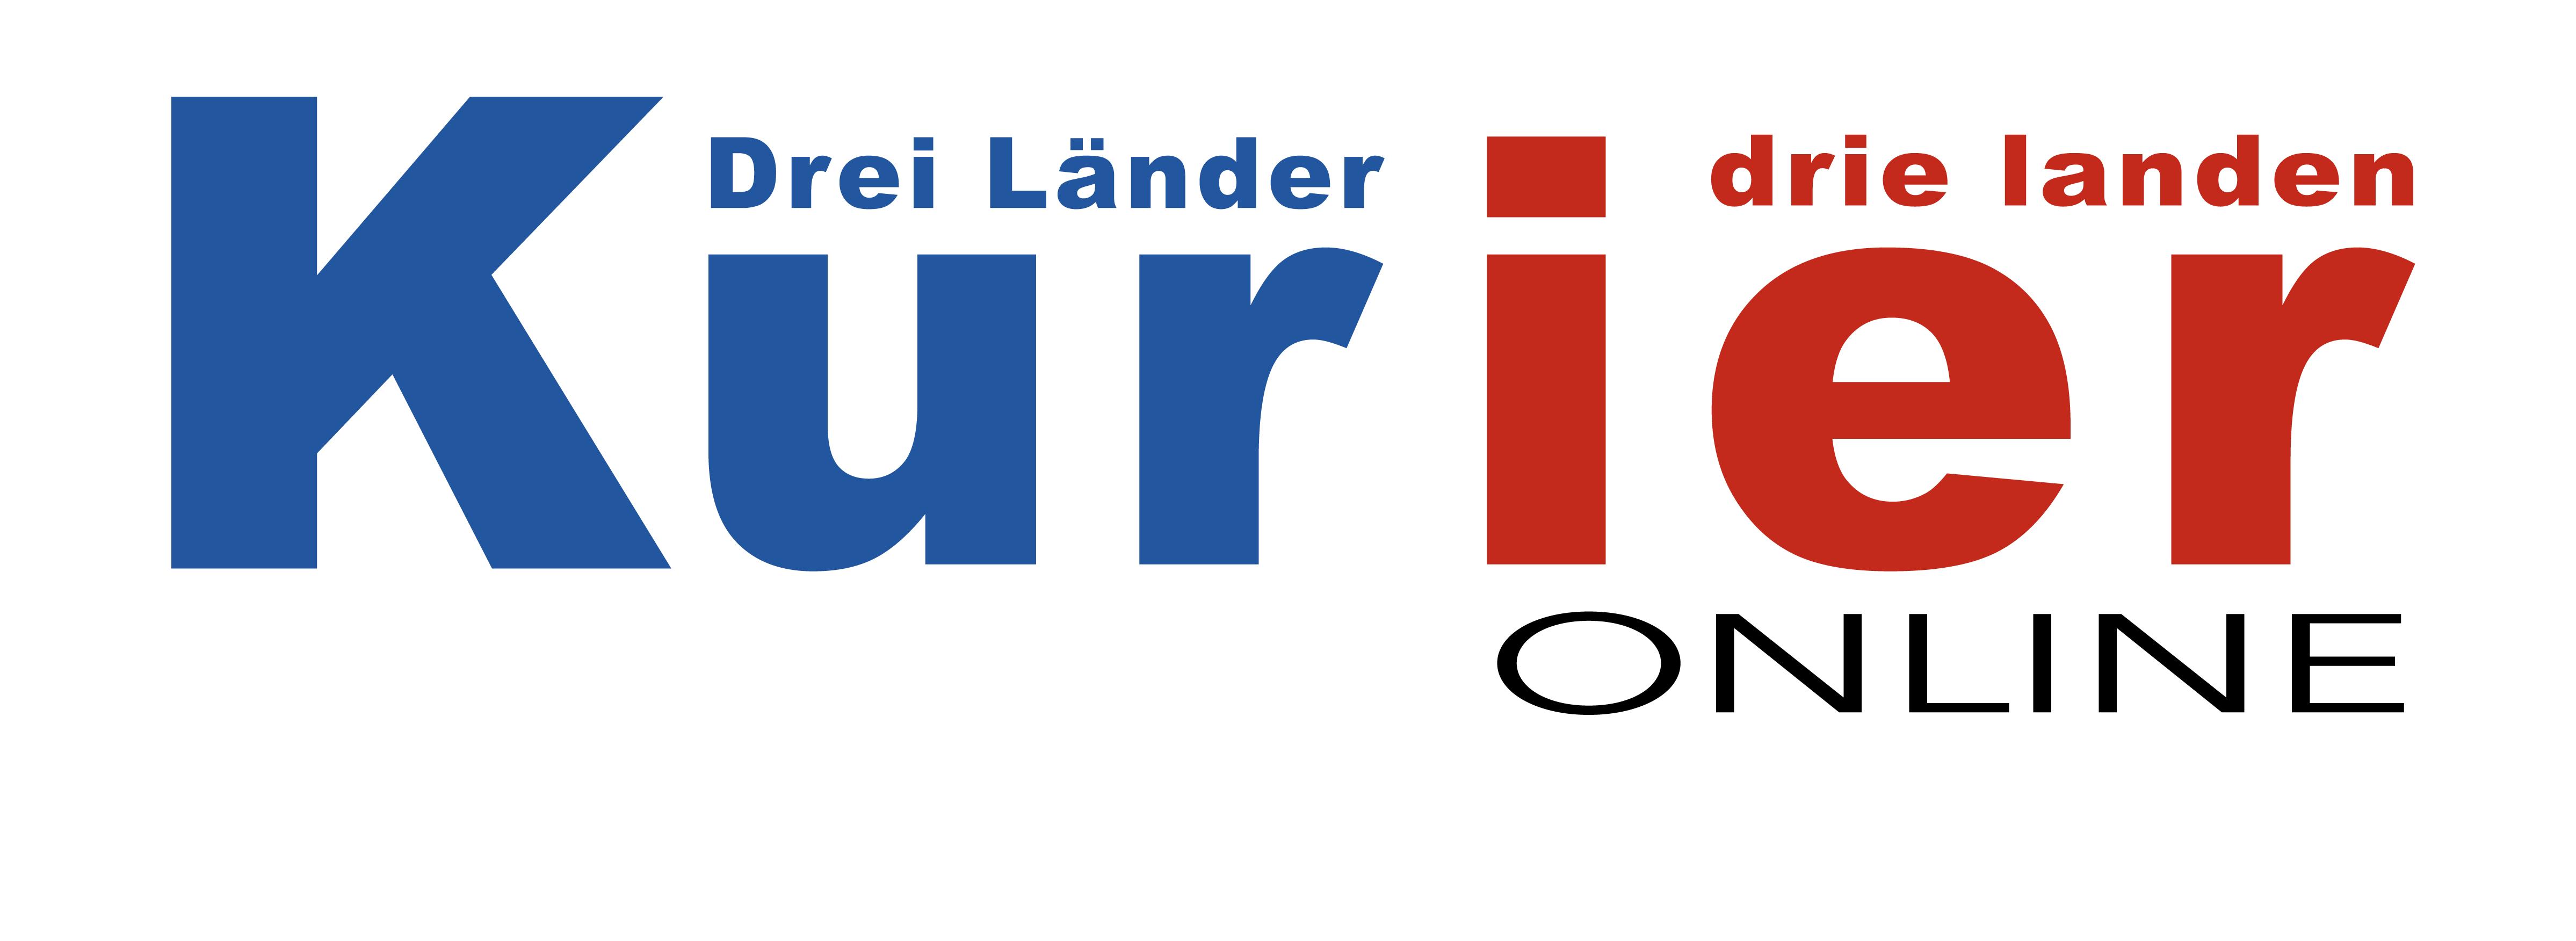 Logo Drei Länder Kurier